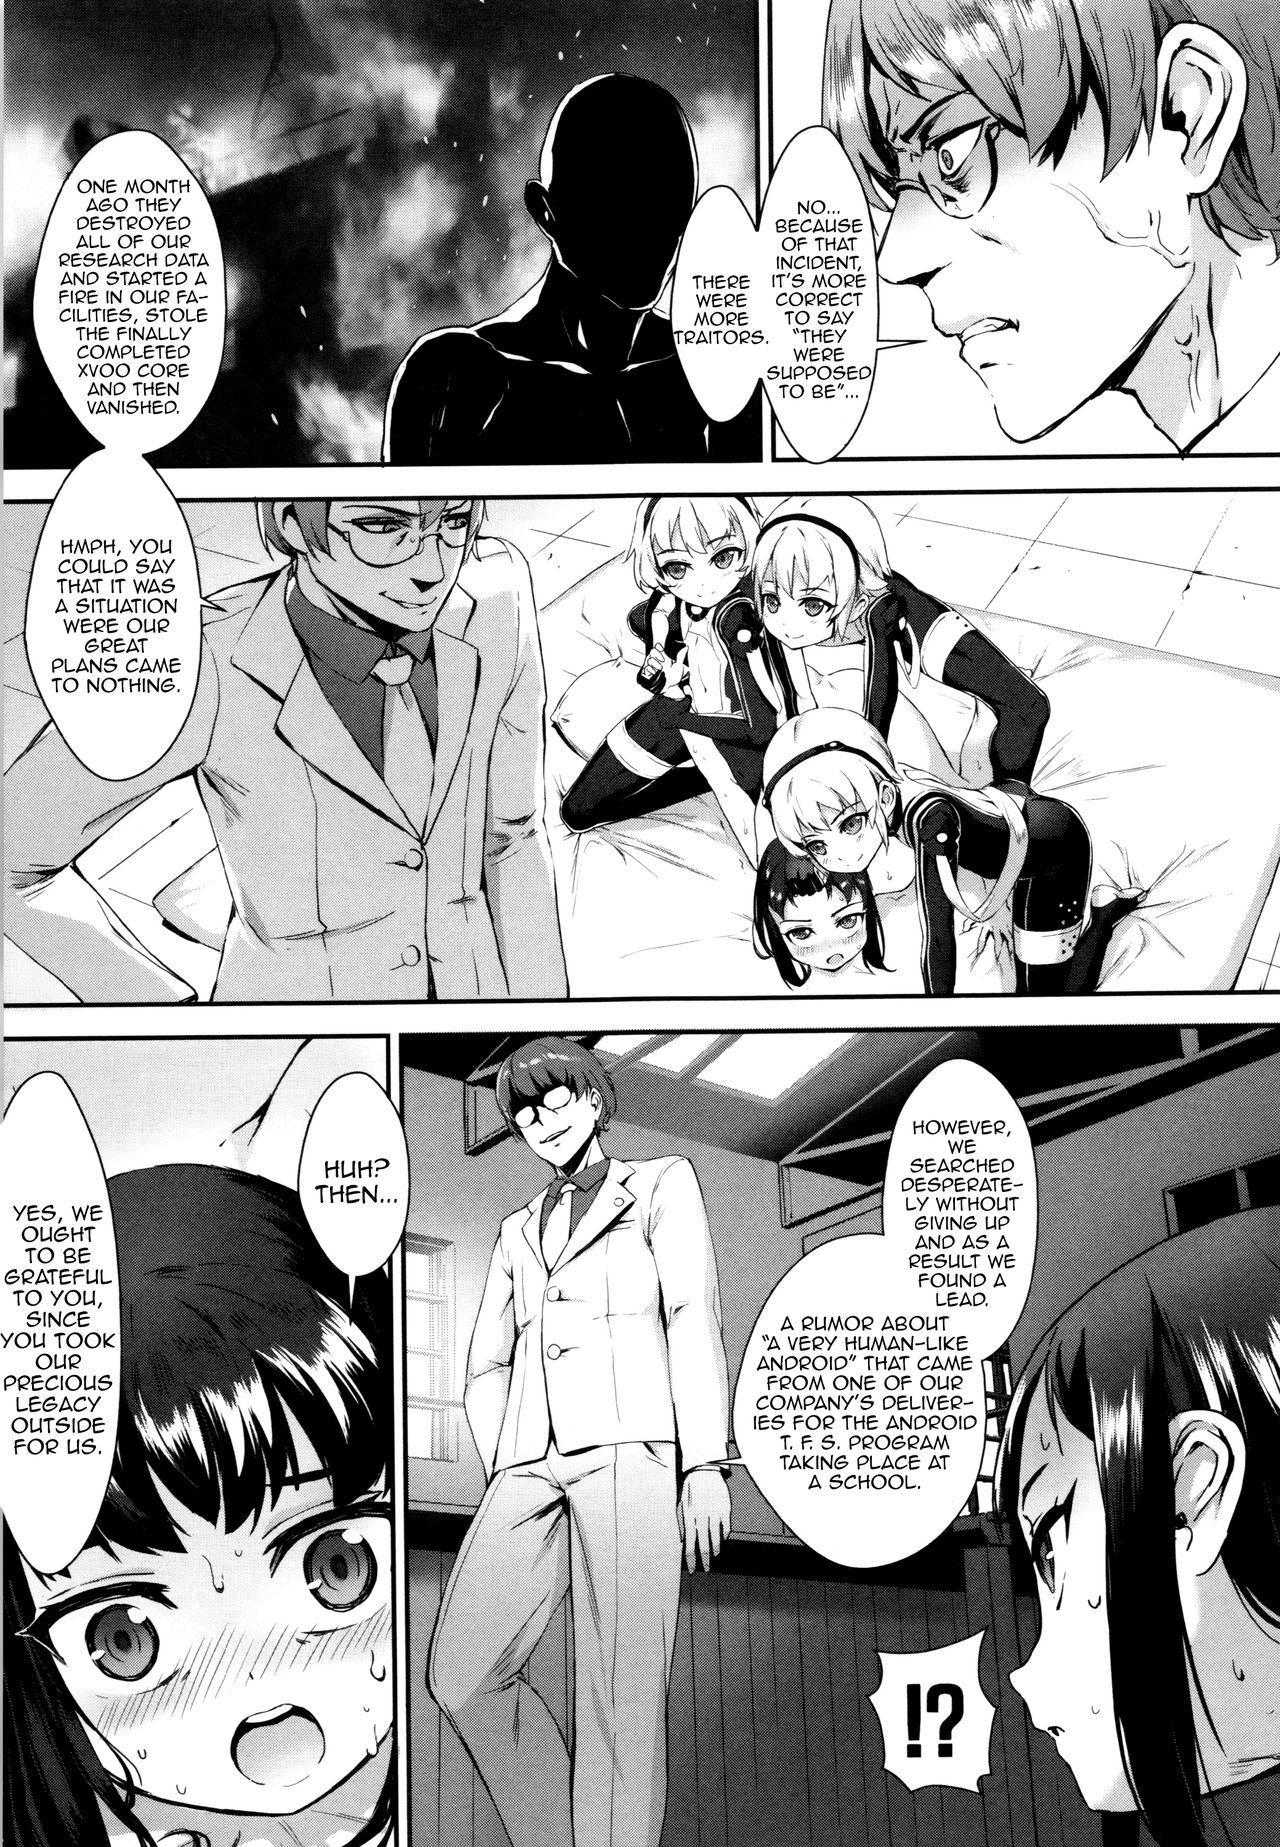 [Jairou] Erotic Training! ~Pakopako Rankou Seikyouiku~ Ch. 1-2 [English] [MrBubbles] 94